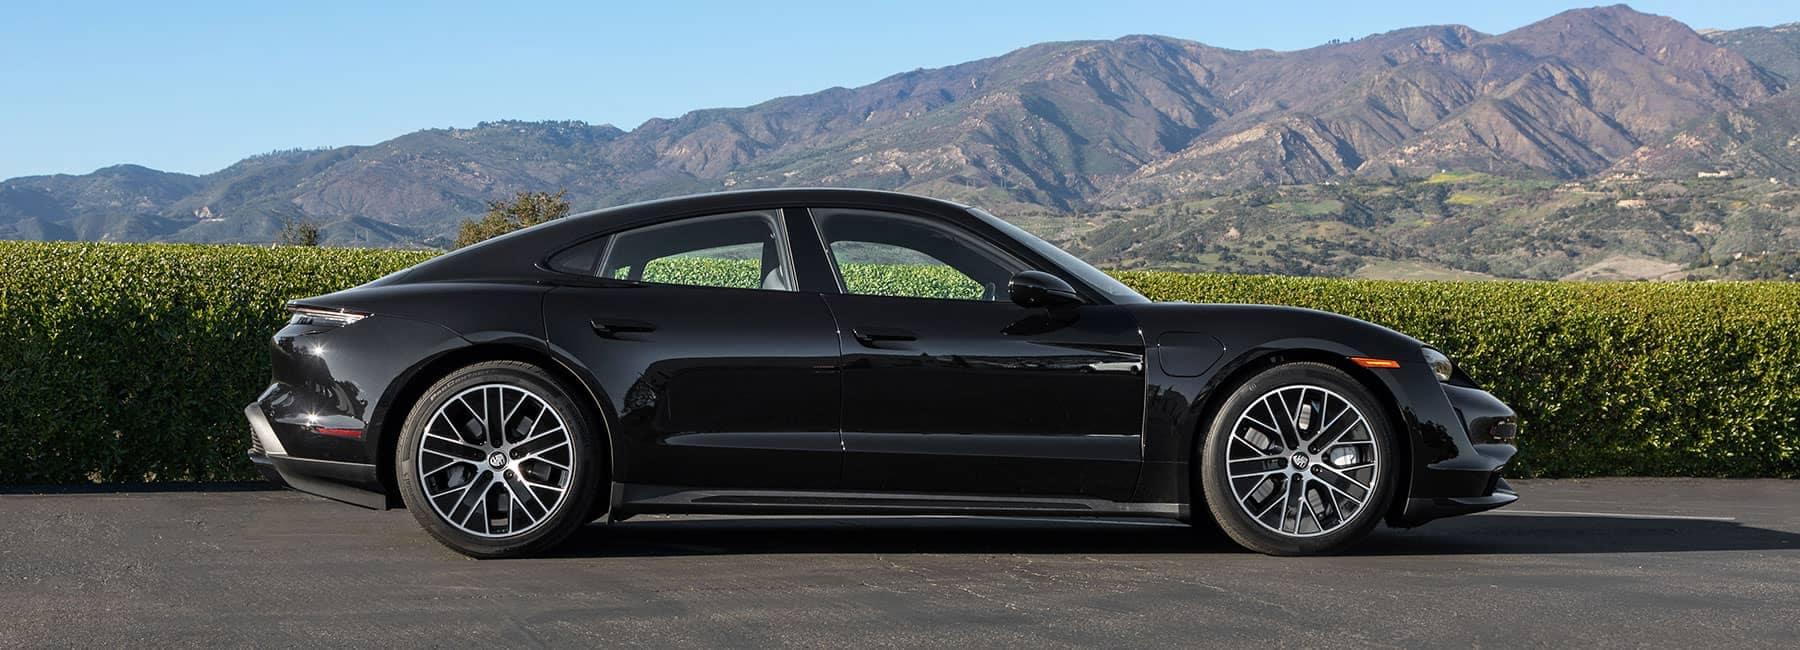 New_2020-Porsche-Taycan-Turbo-5